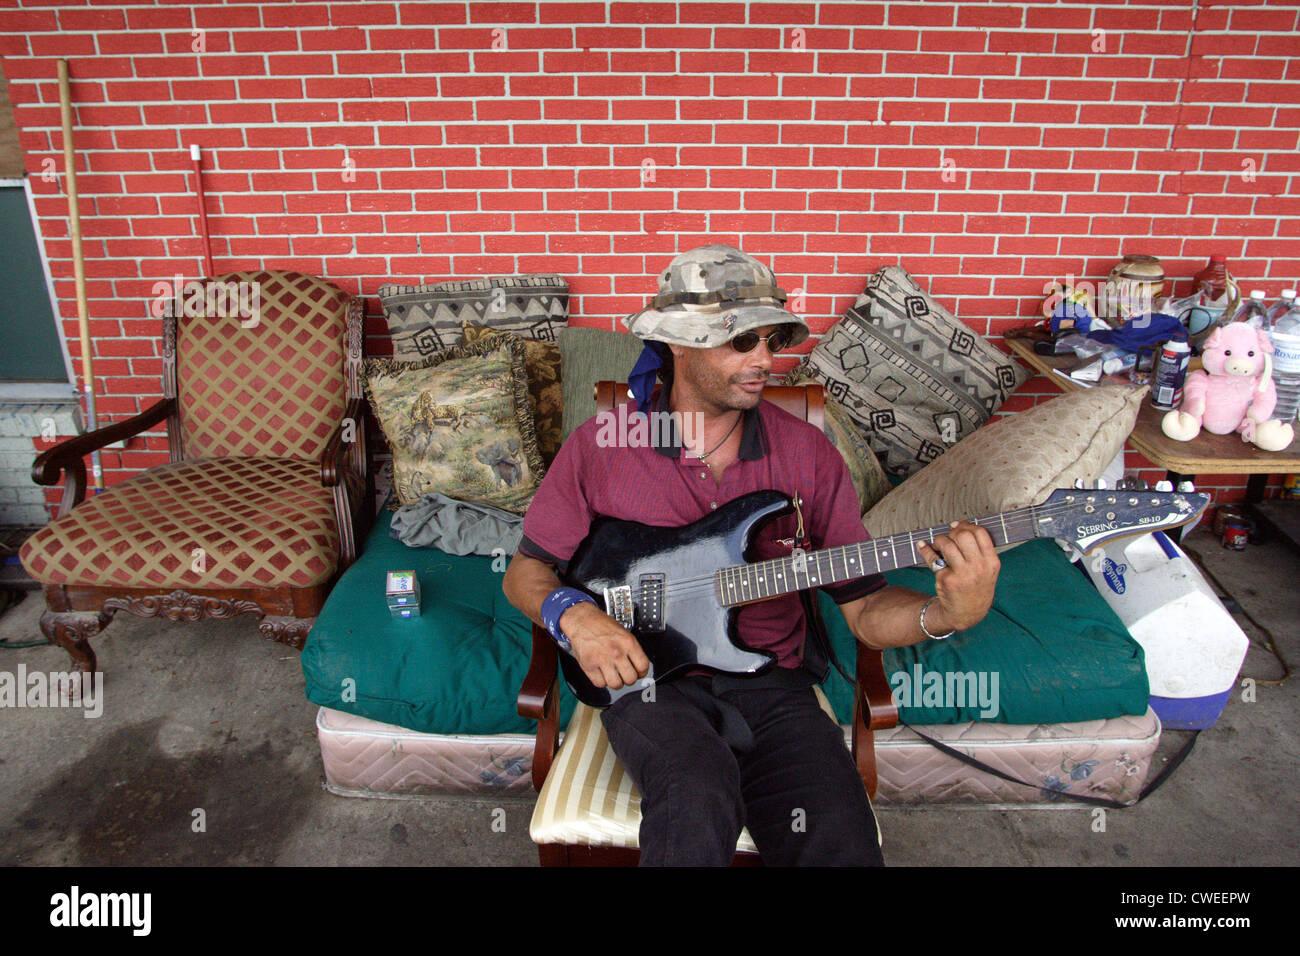 Mann, der seine e-Gitarre spielt nach dem Hurrikan Katrina Stockbild